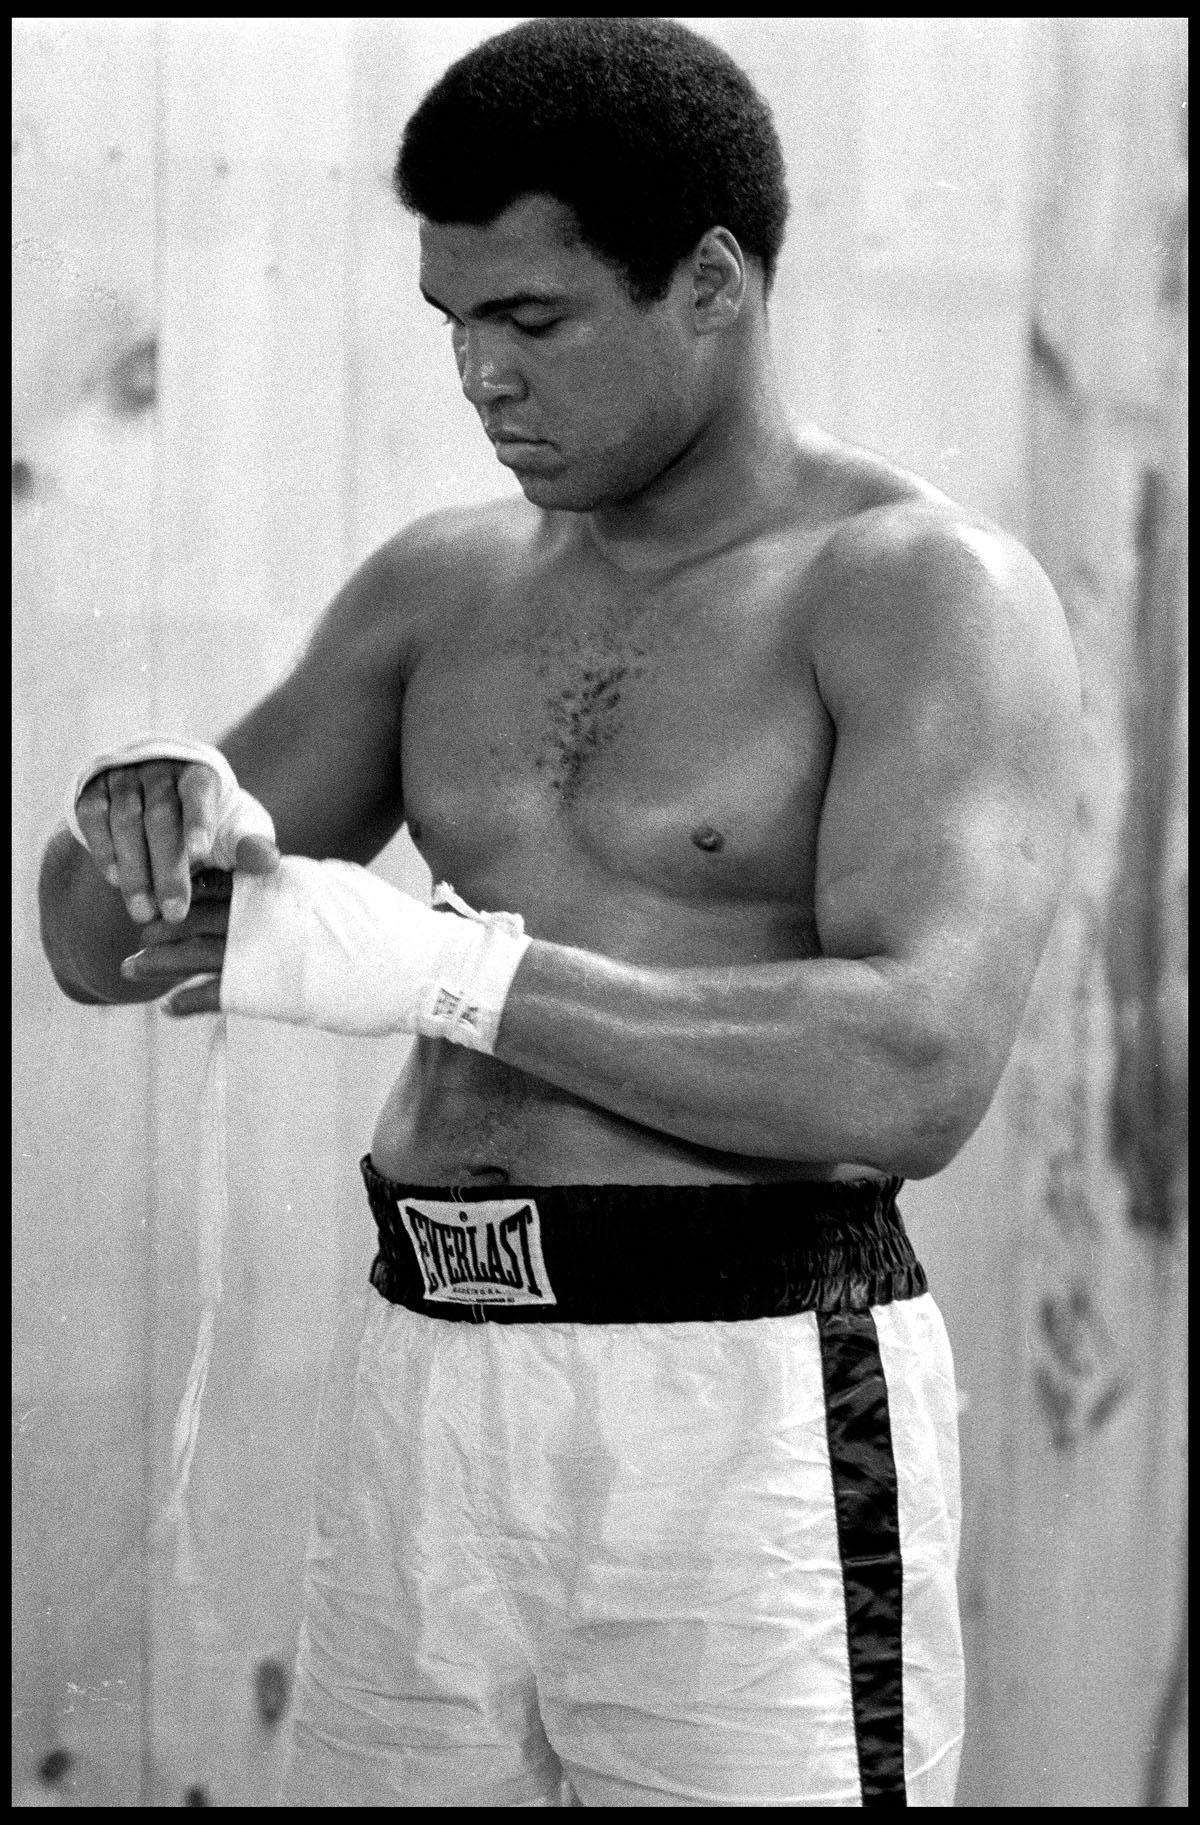 Muhammad Ali Training at the 5th Street Gym, Miami Beach